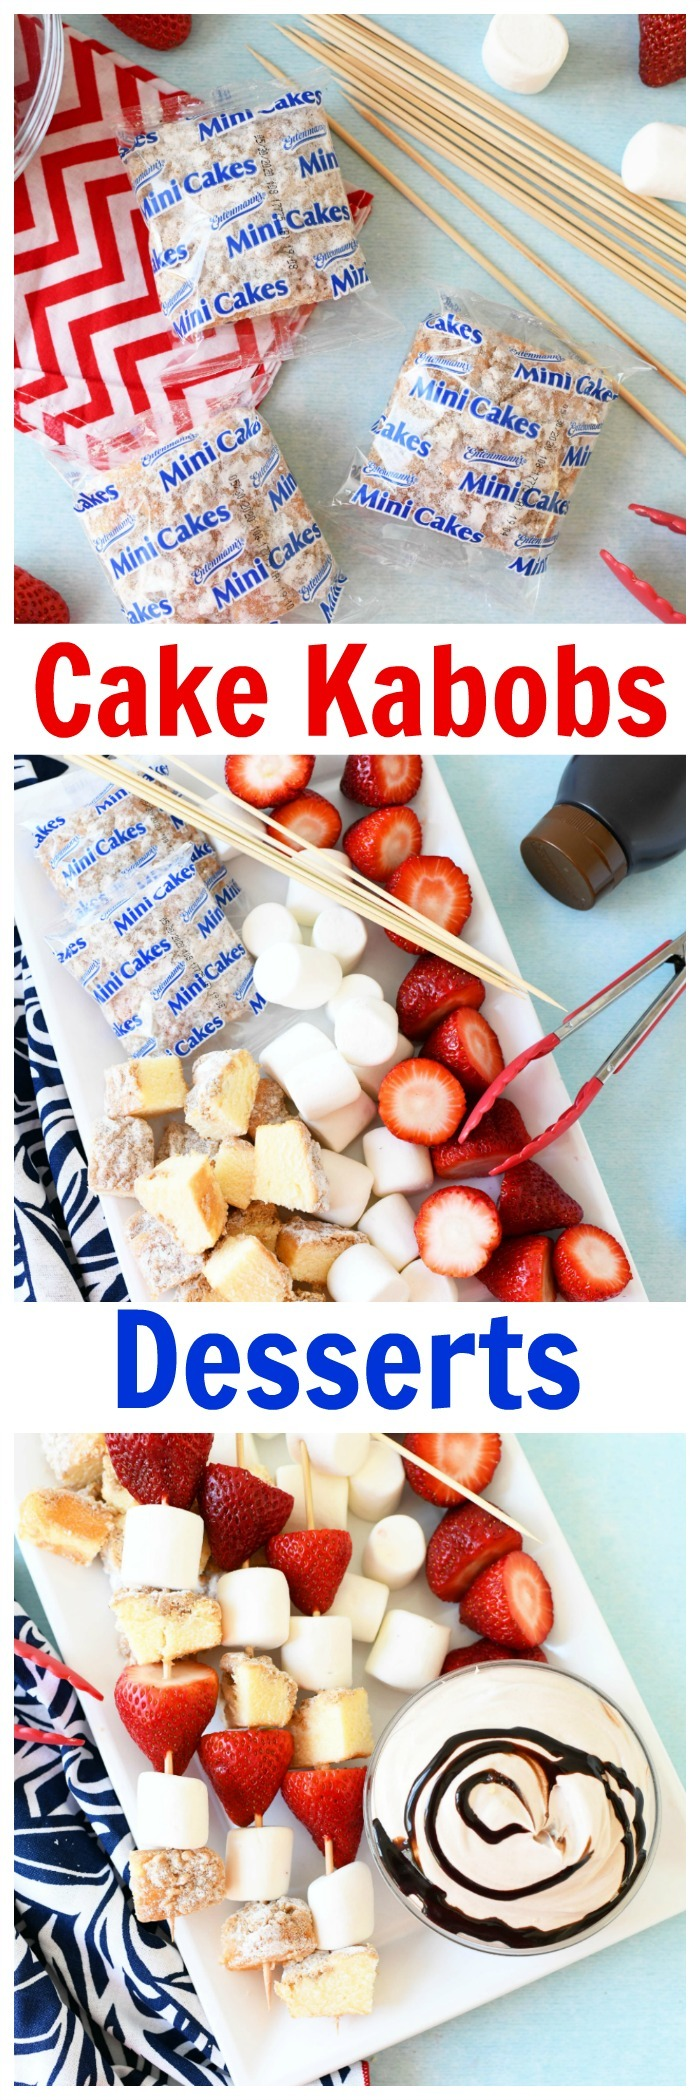 Fruit & Cake Kabobs with Chocolate Fluff Dip